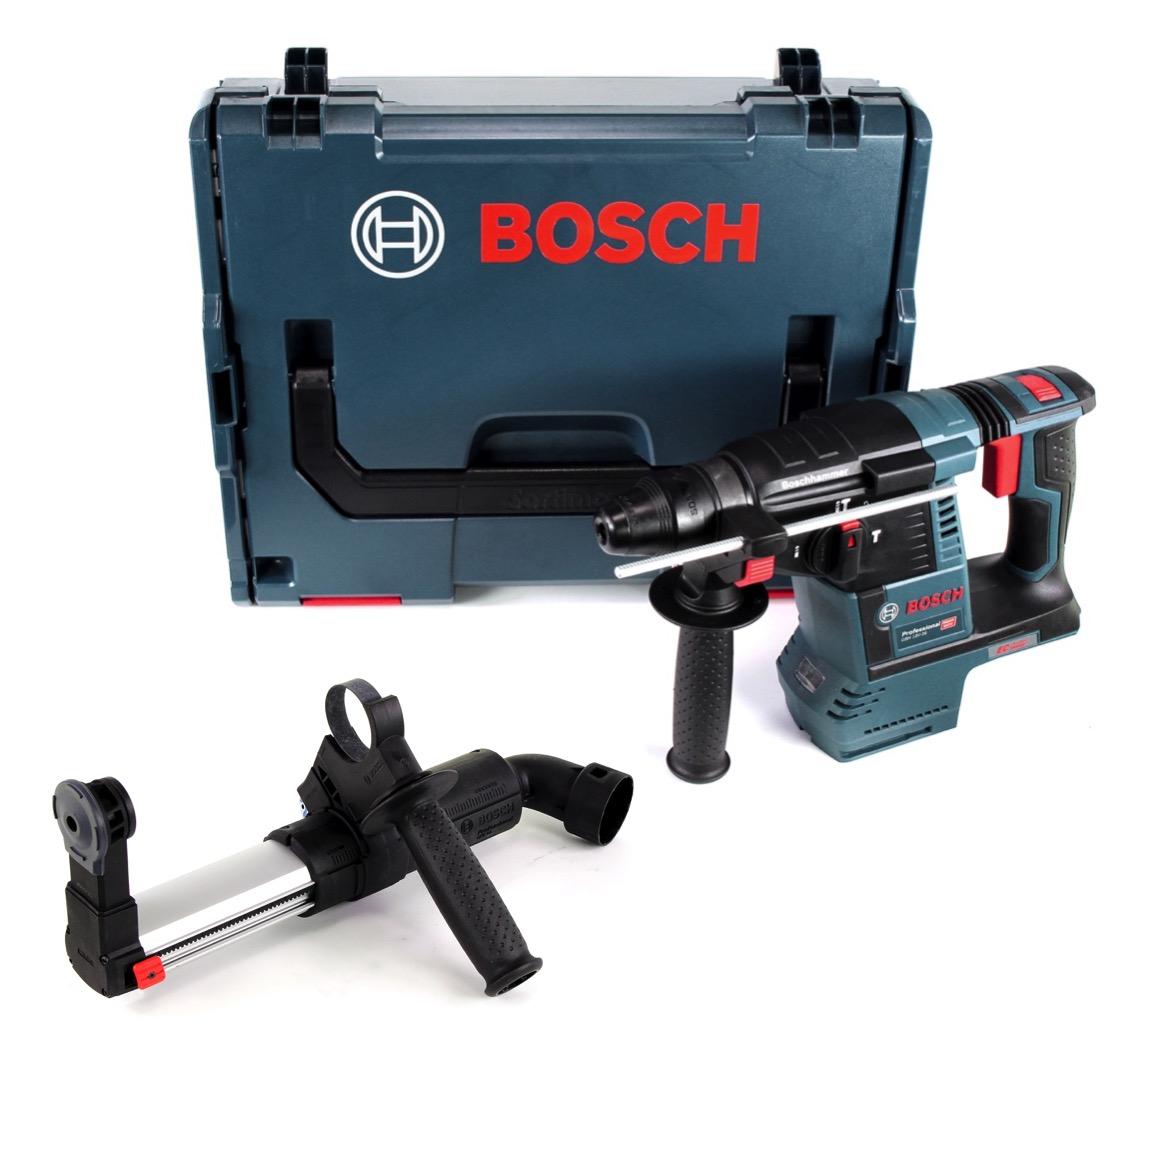 bosch gbh 18 v-26 akku bohrhammer professional sds-plus in l-boxx +